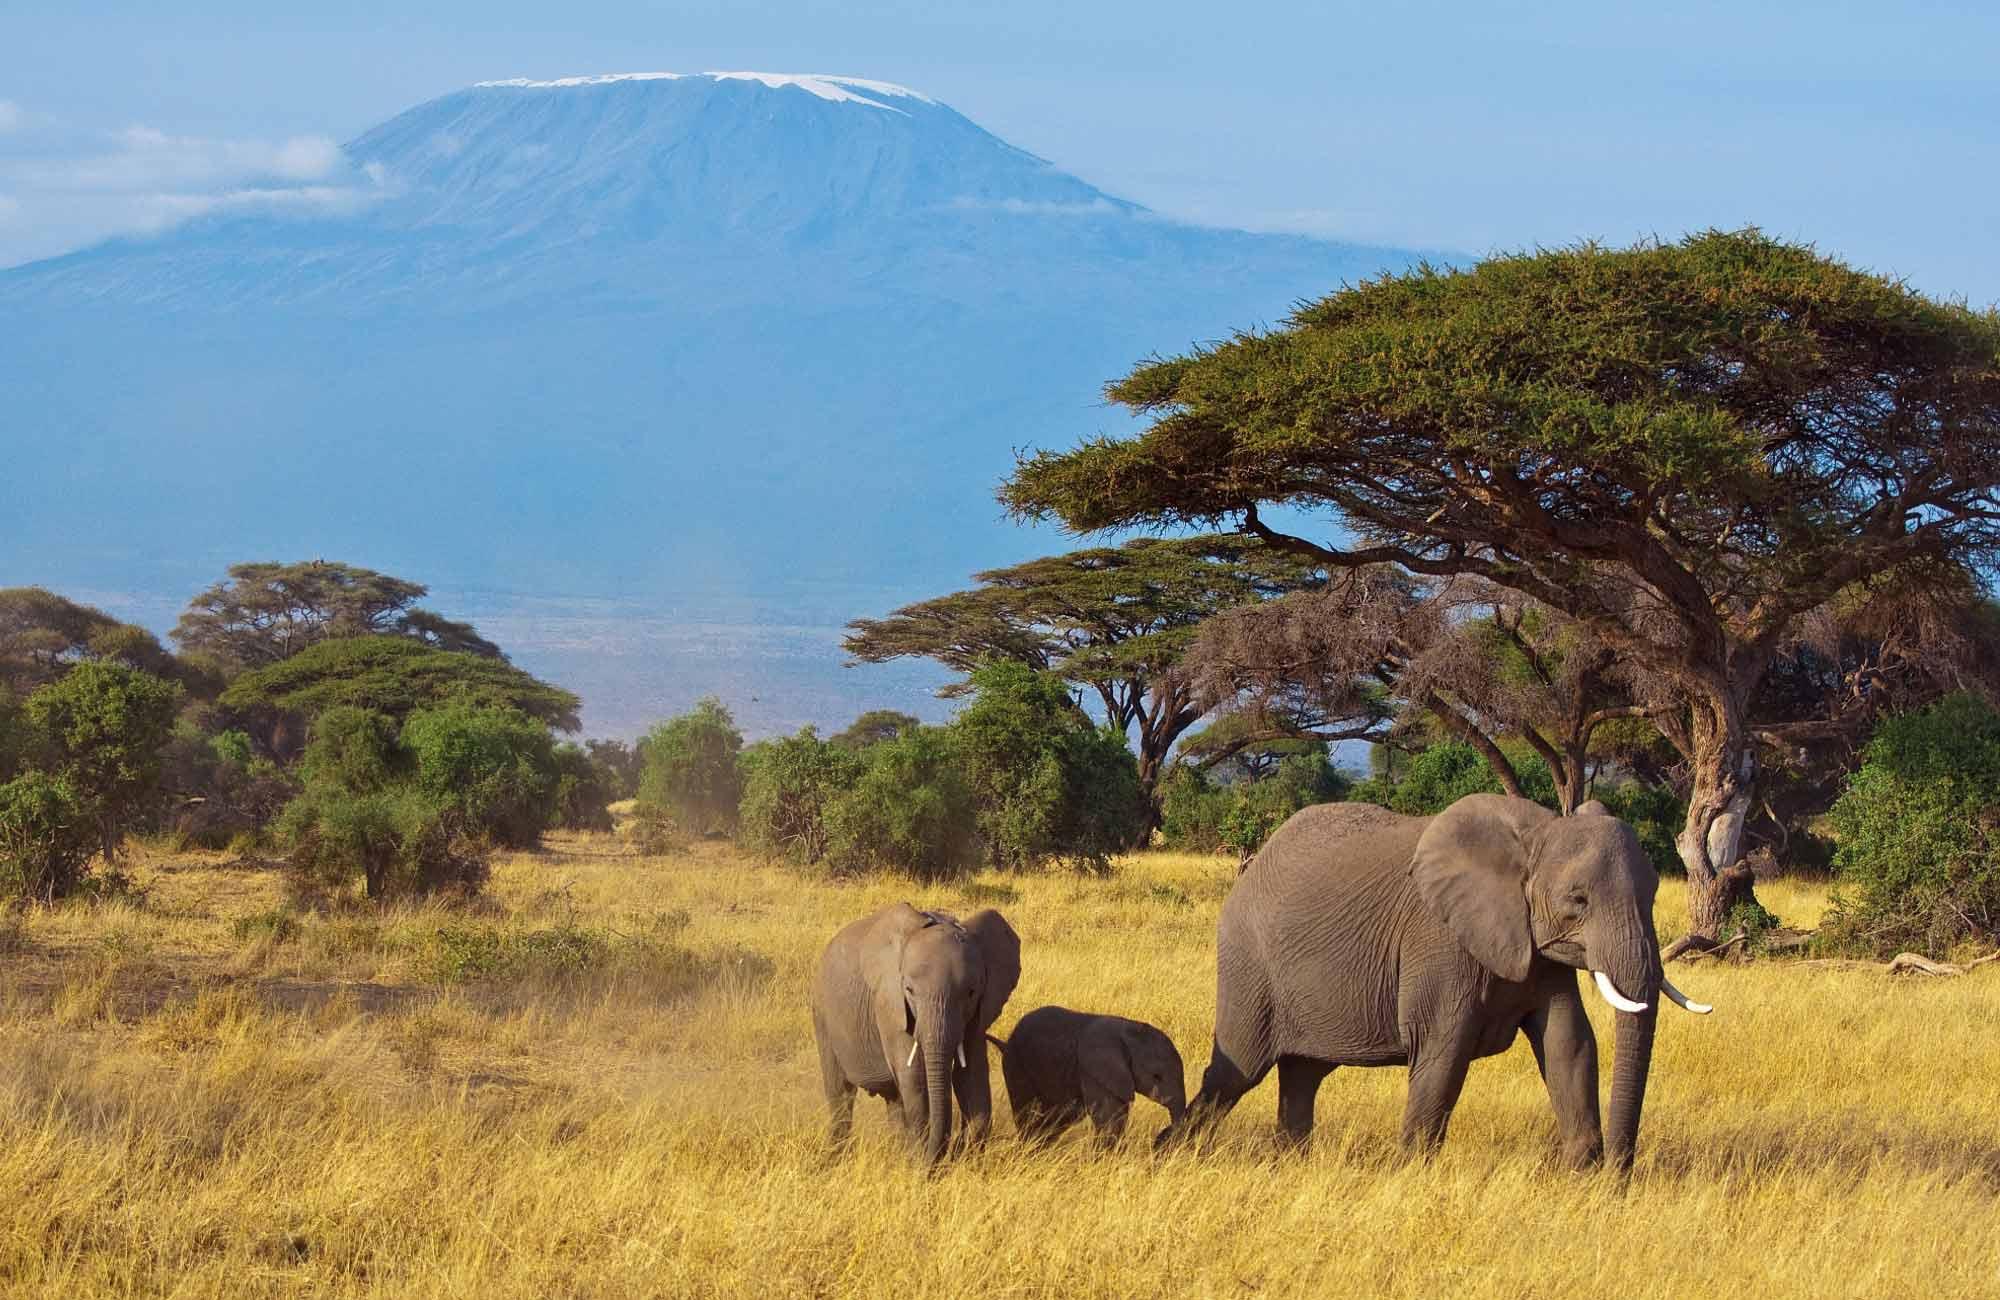 Elephants devant le Kilimandjaro en Tanzanie